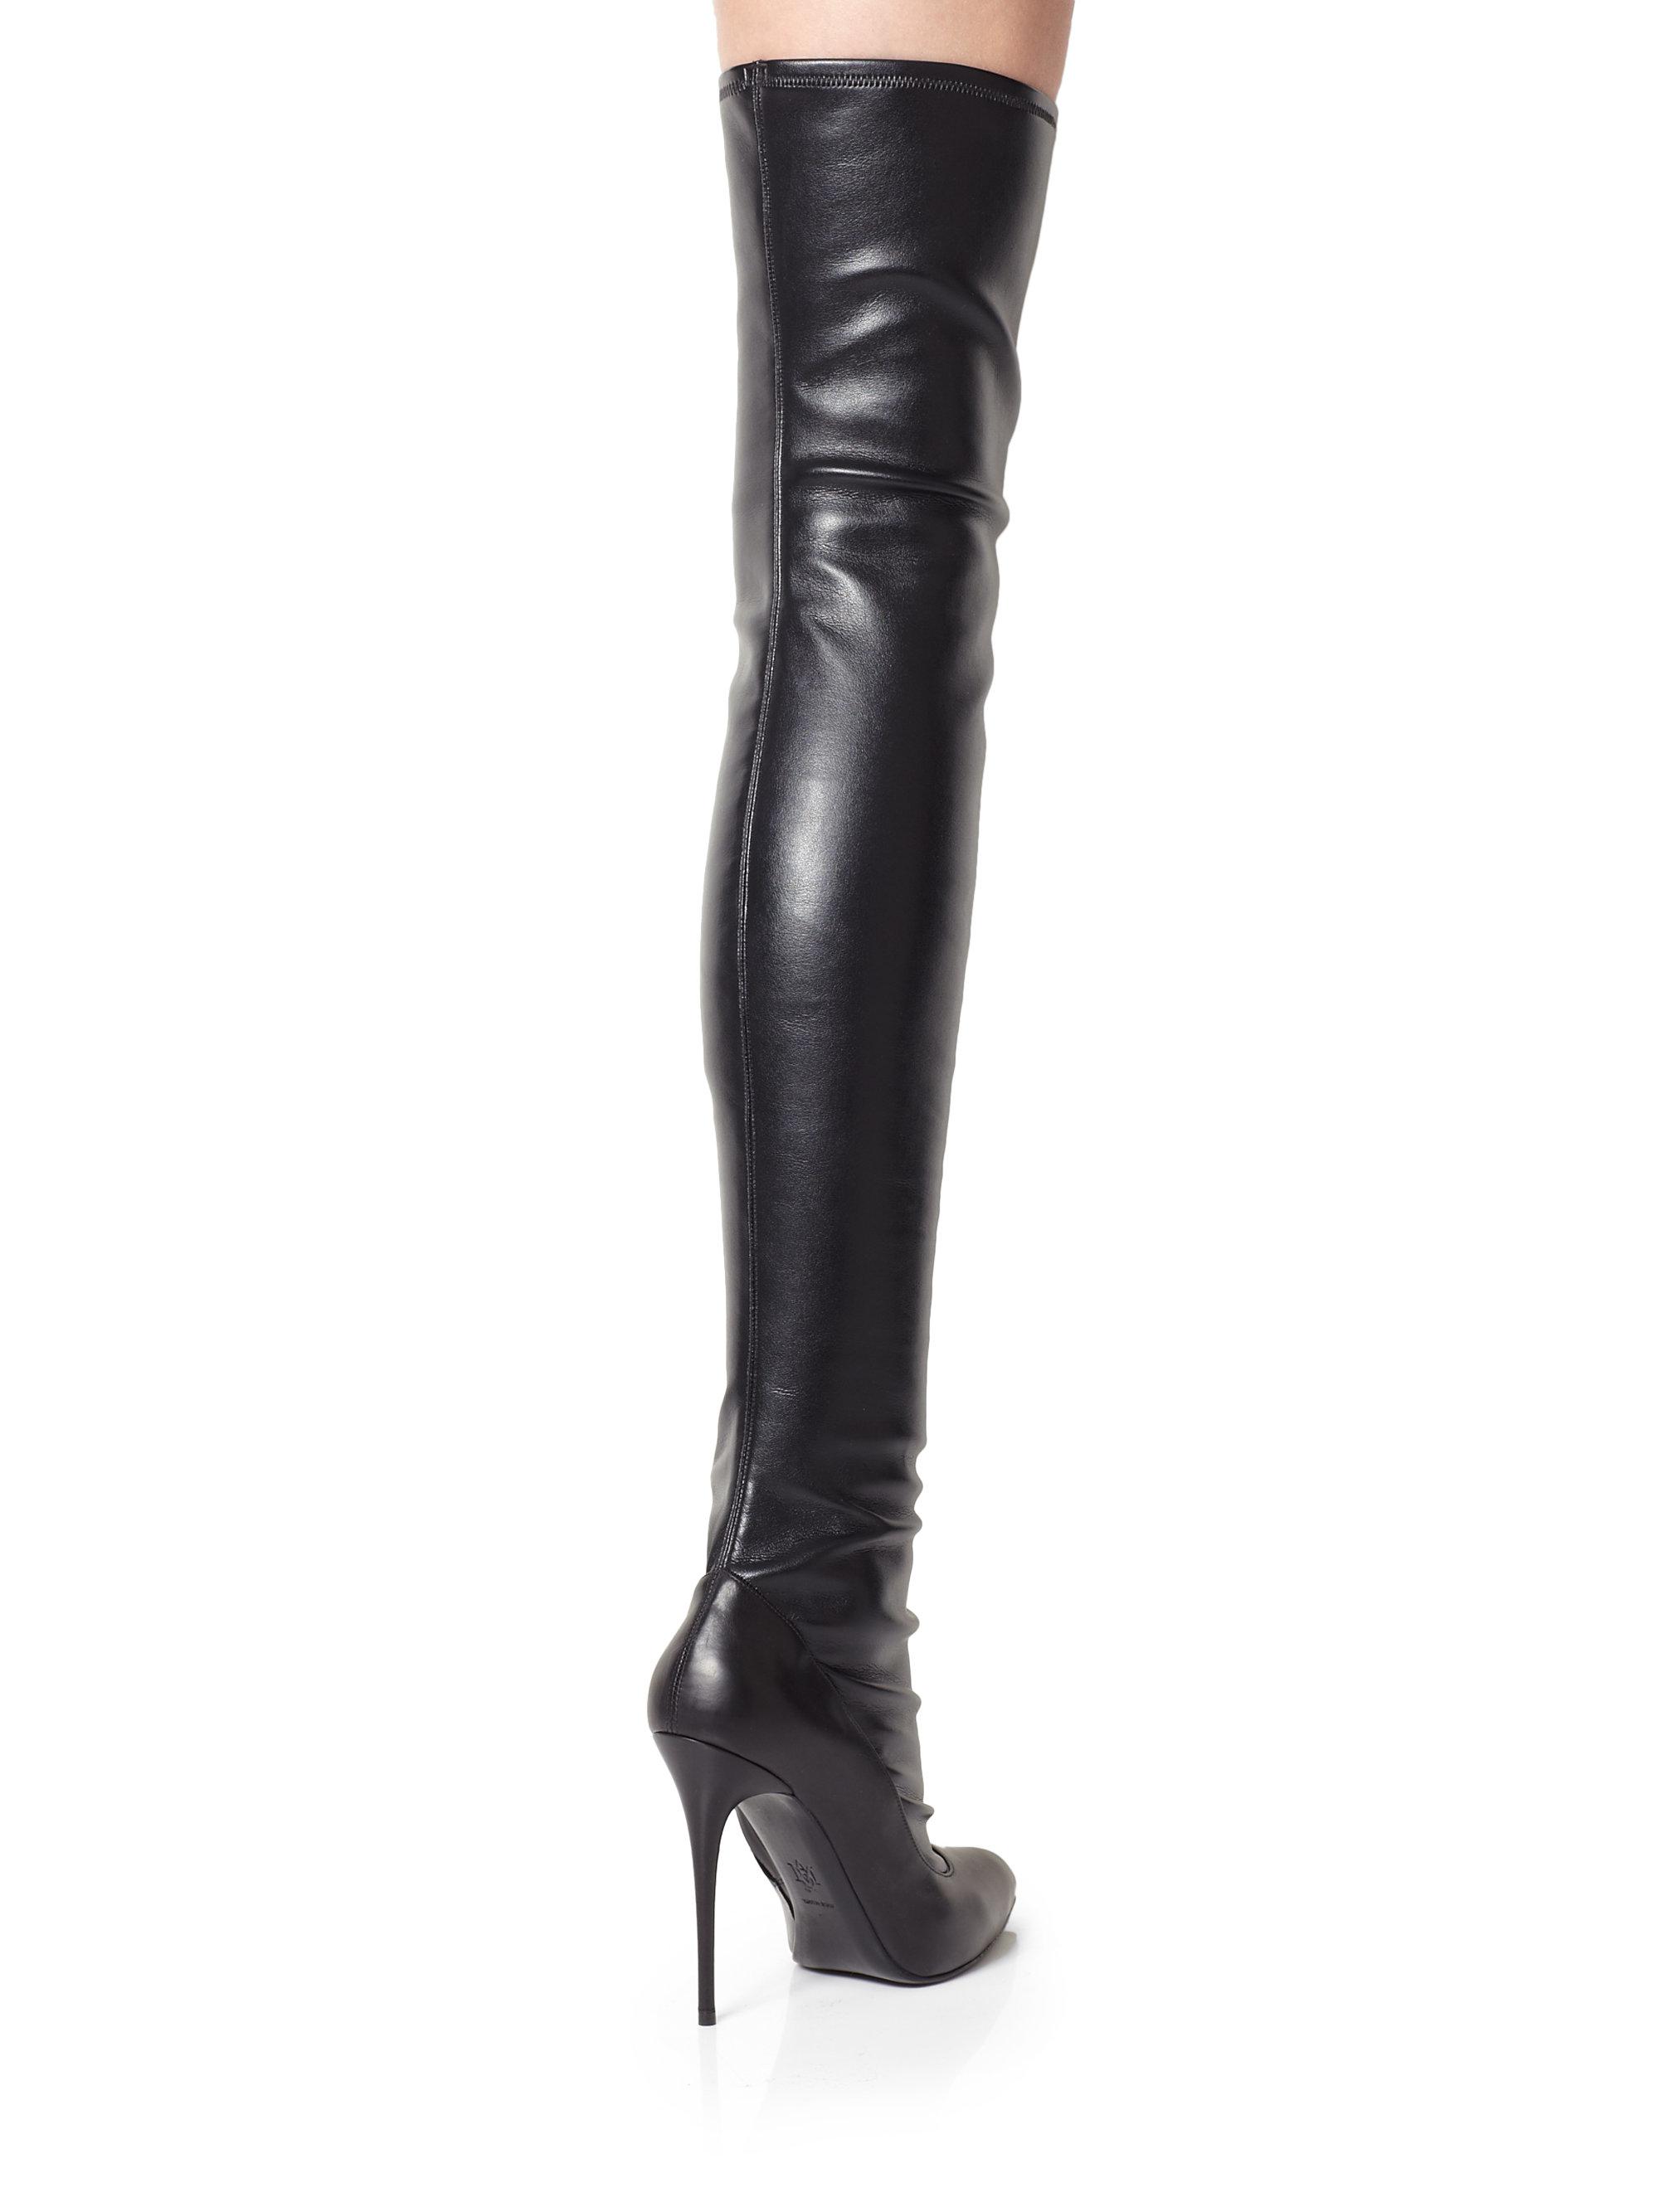 thigh boots - Black Alexander McQueen mHc26